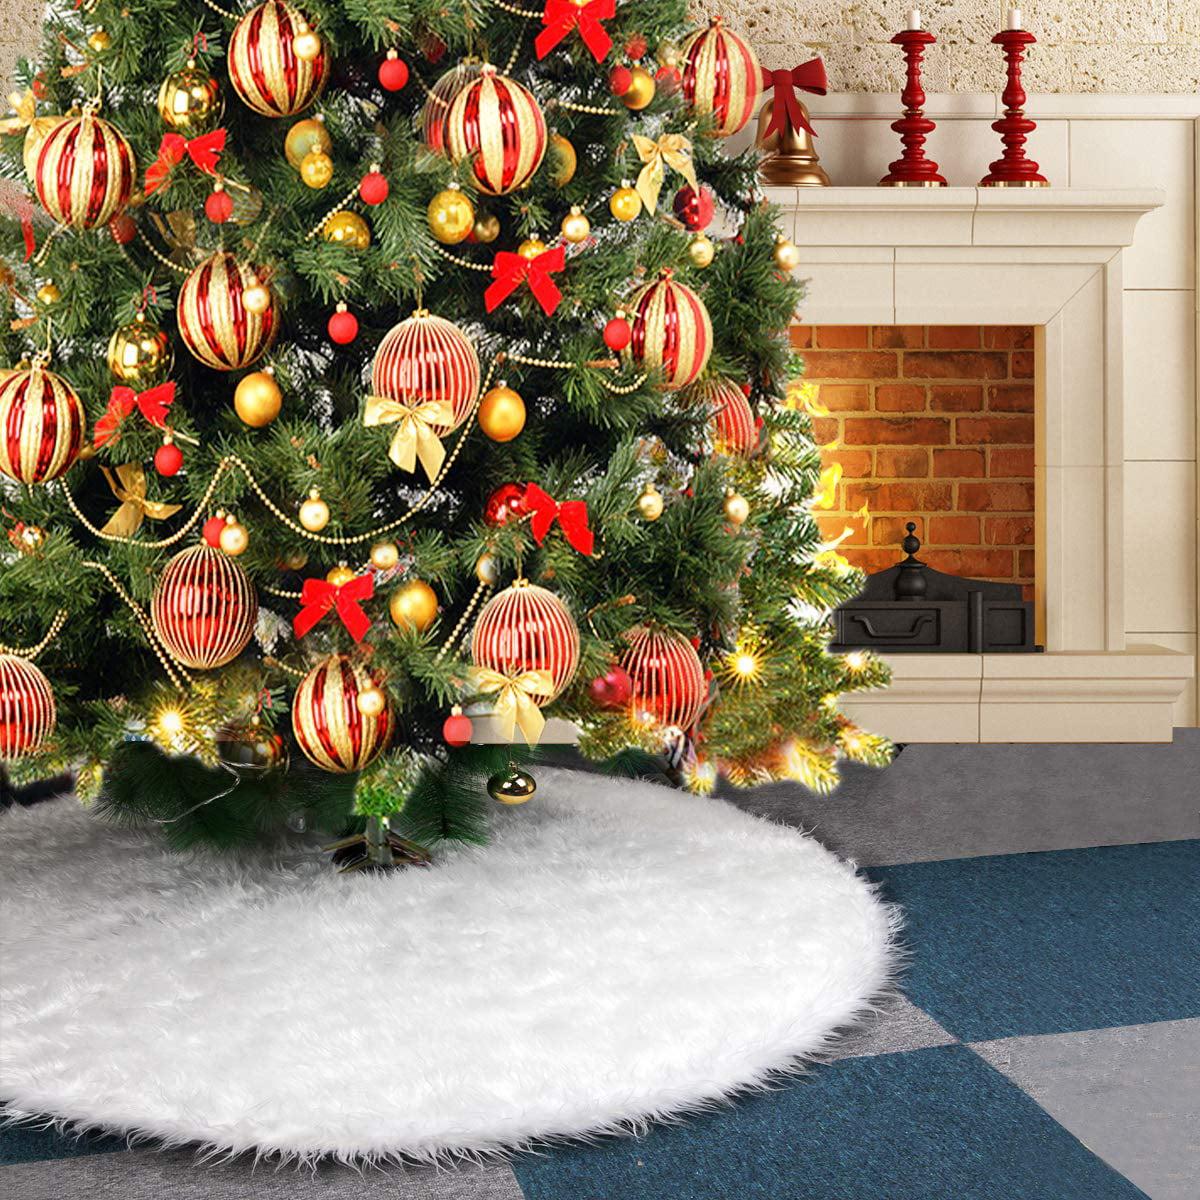 Christmas Tree Skirts White Tree Skirt Decorations Faux Fur Skirt Large Christmas Ornaments Tree Decor 35 Inch Walmart Com Walmart Com